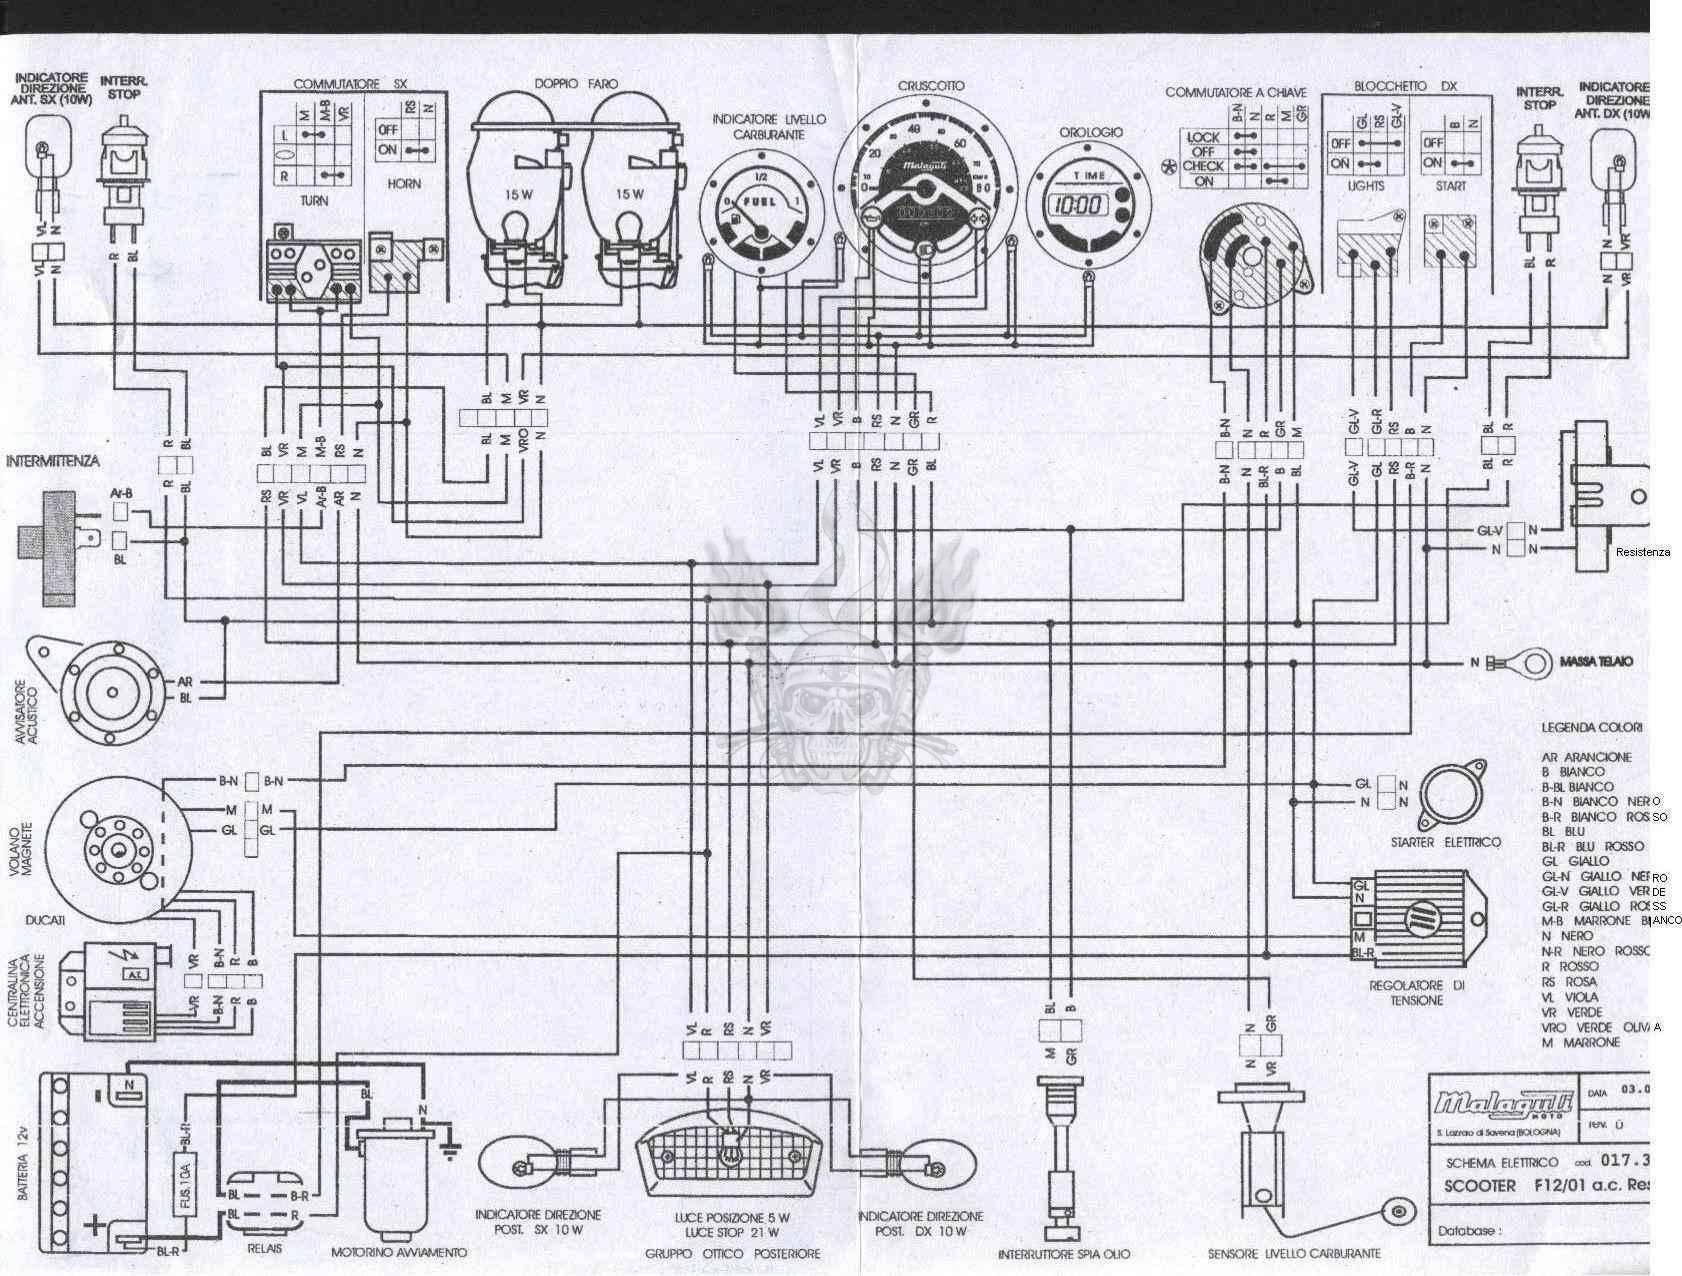 small resolution of malaguti motorcycle manuals pdf wiring diagrams u0026 fault codes mix download moto schem malaguti f12 phantom ac bj01 scooter